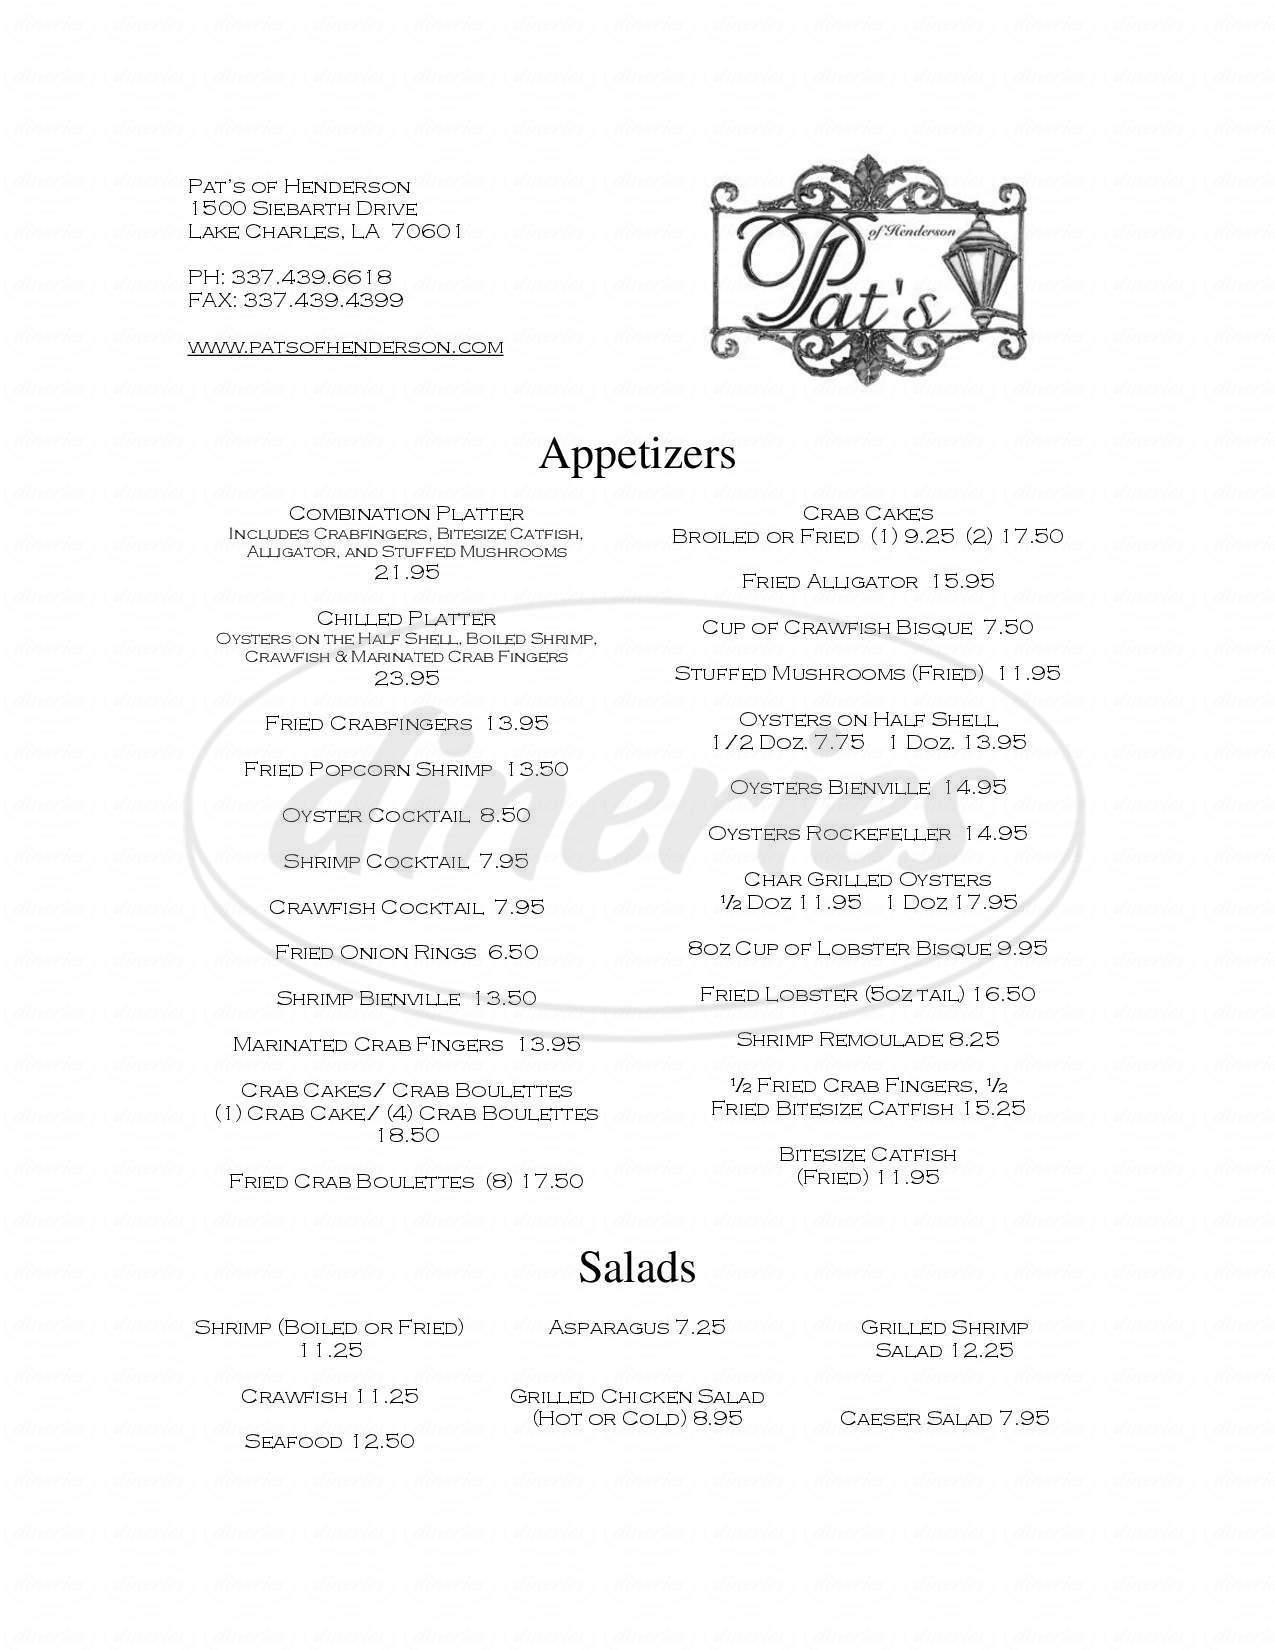 menu for Pat's of Henderson